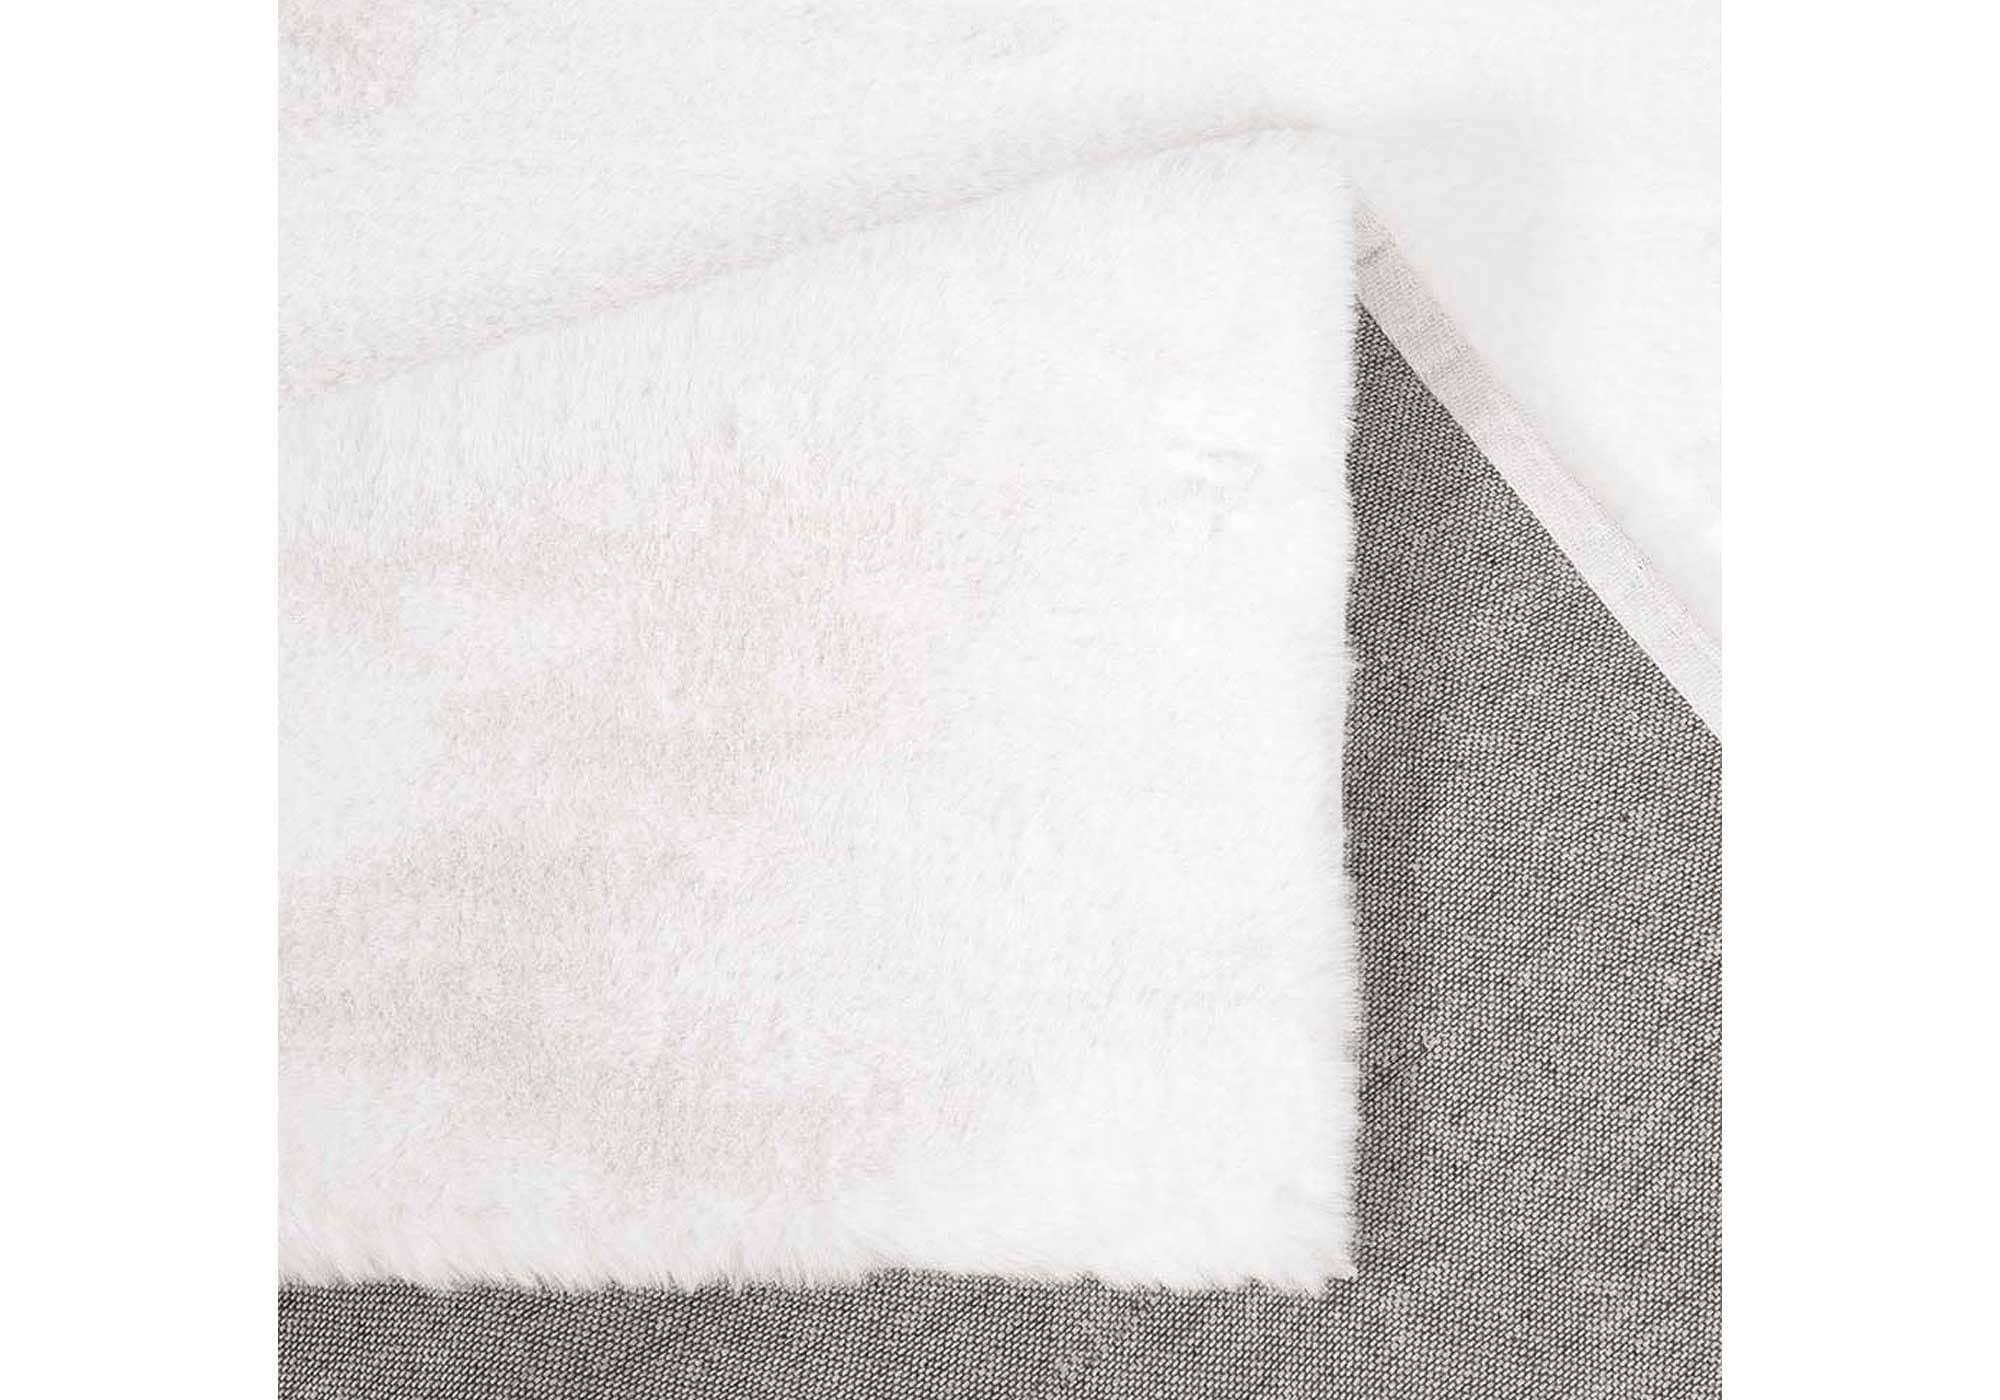 Hochflor-Teppich natur 120 x 170 cm - Soft Touch 900